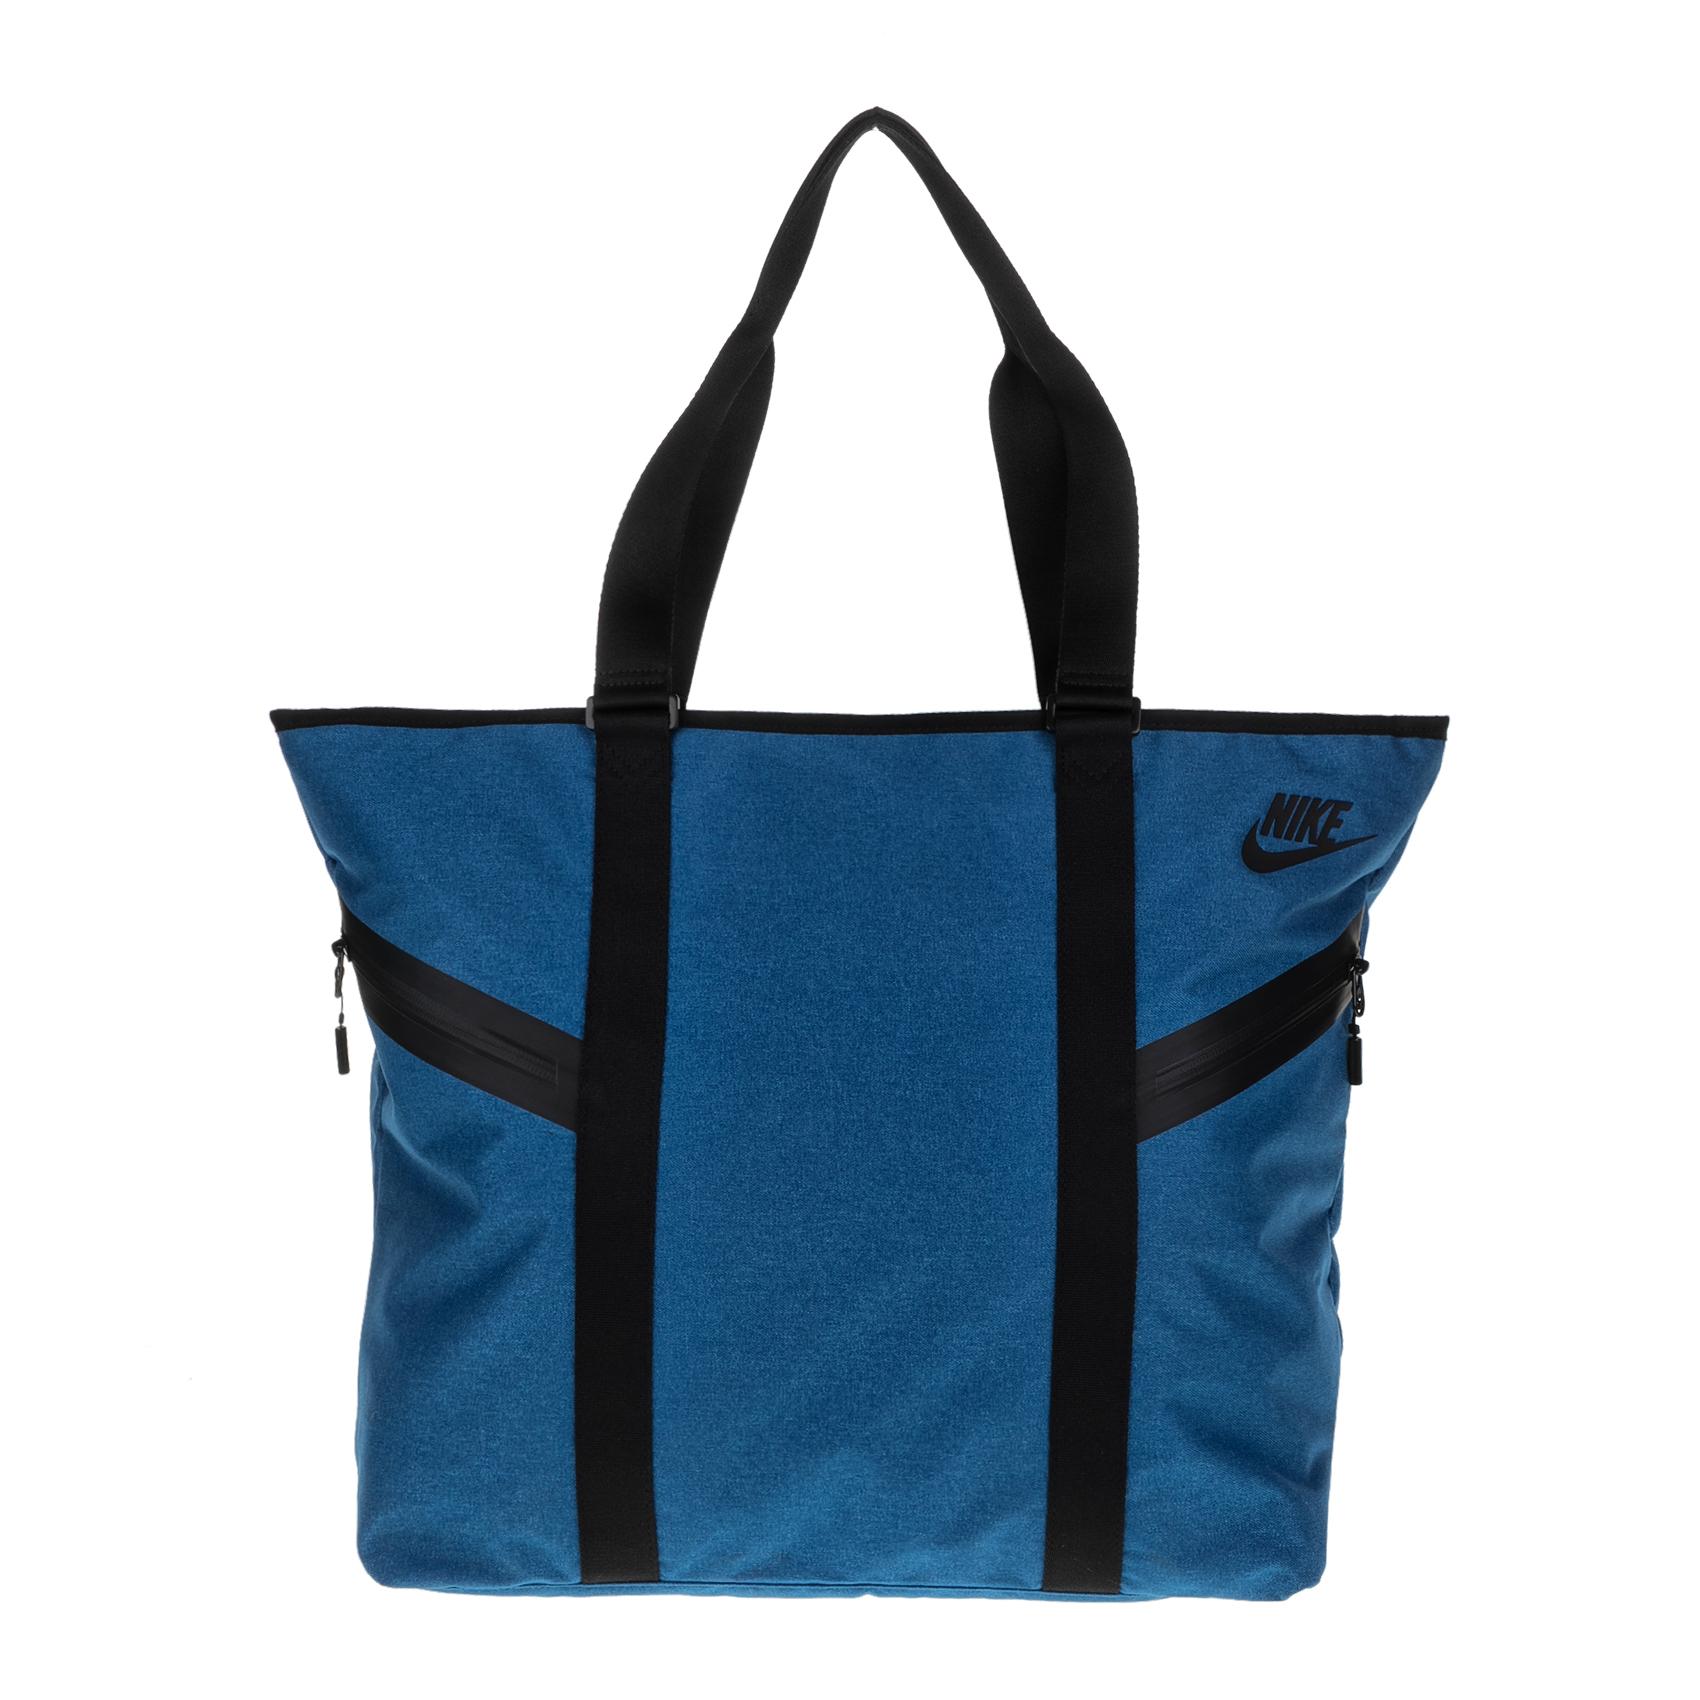 9248b25739 NIKE - Γυναικεία τσάντα ωμου Nike AZEDA TOTE PREMIUM μπλε